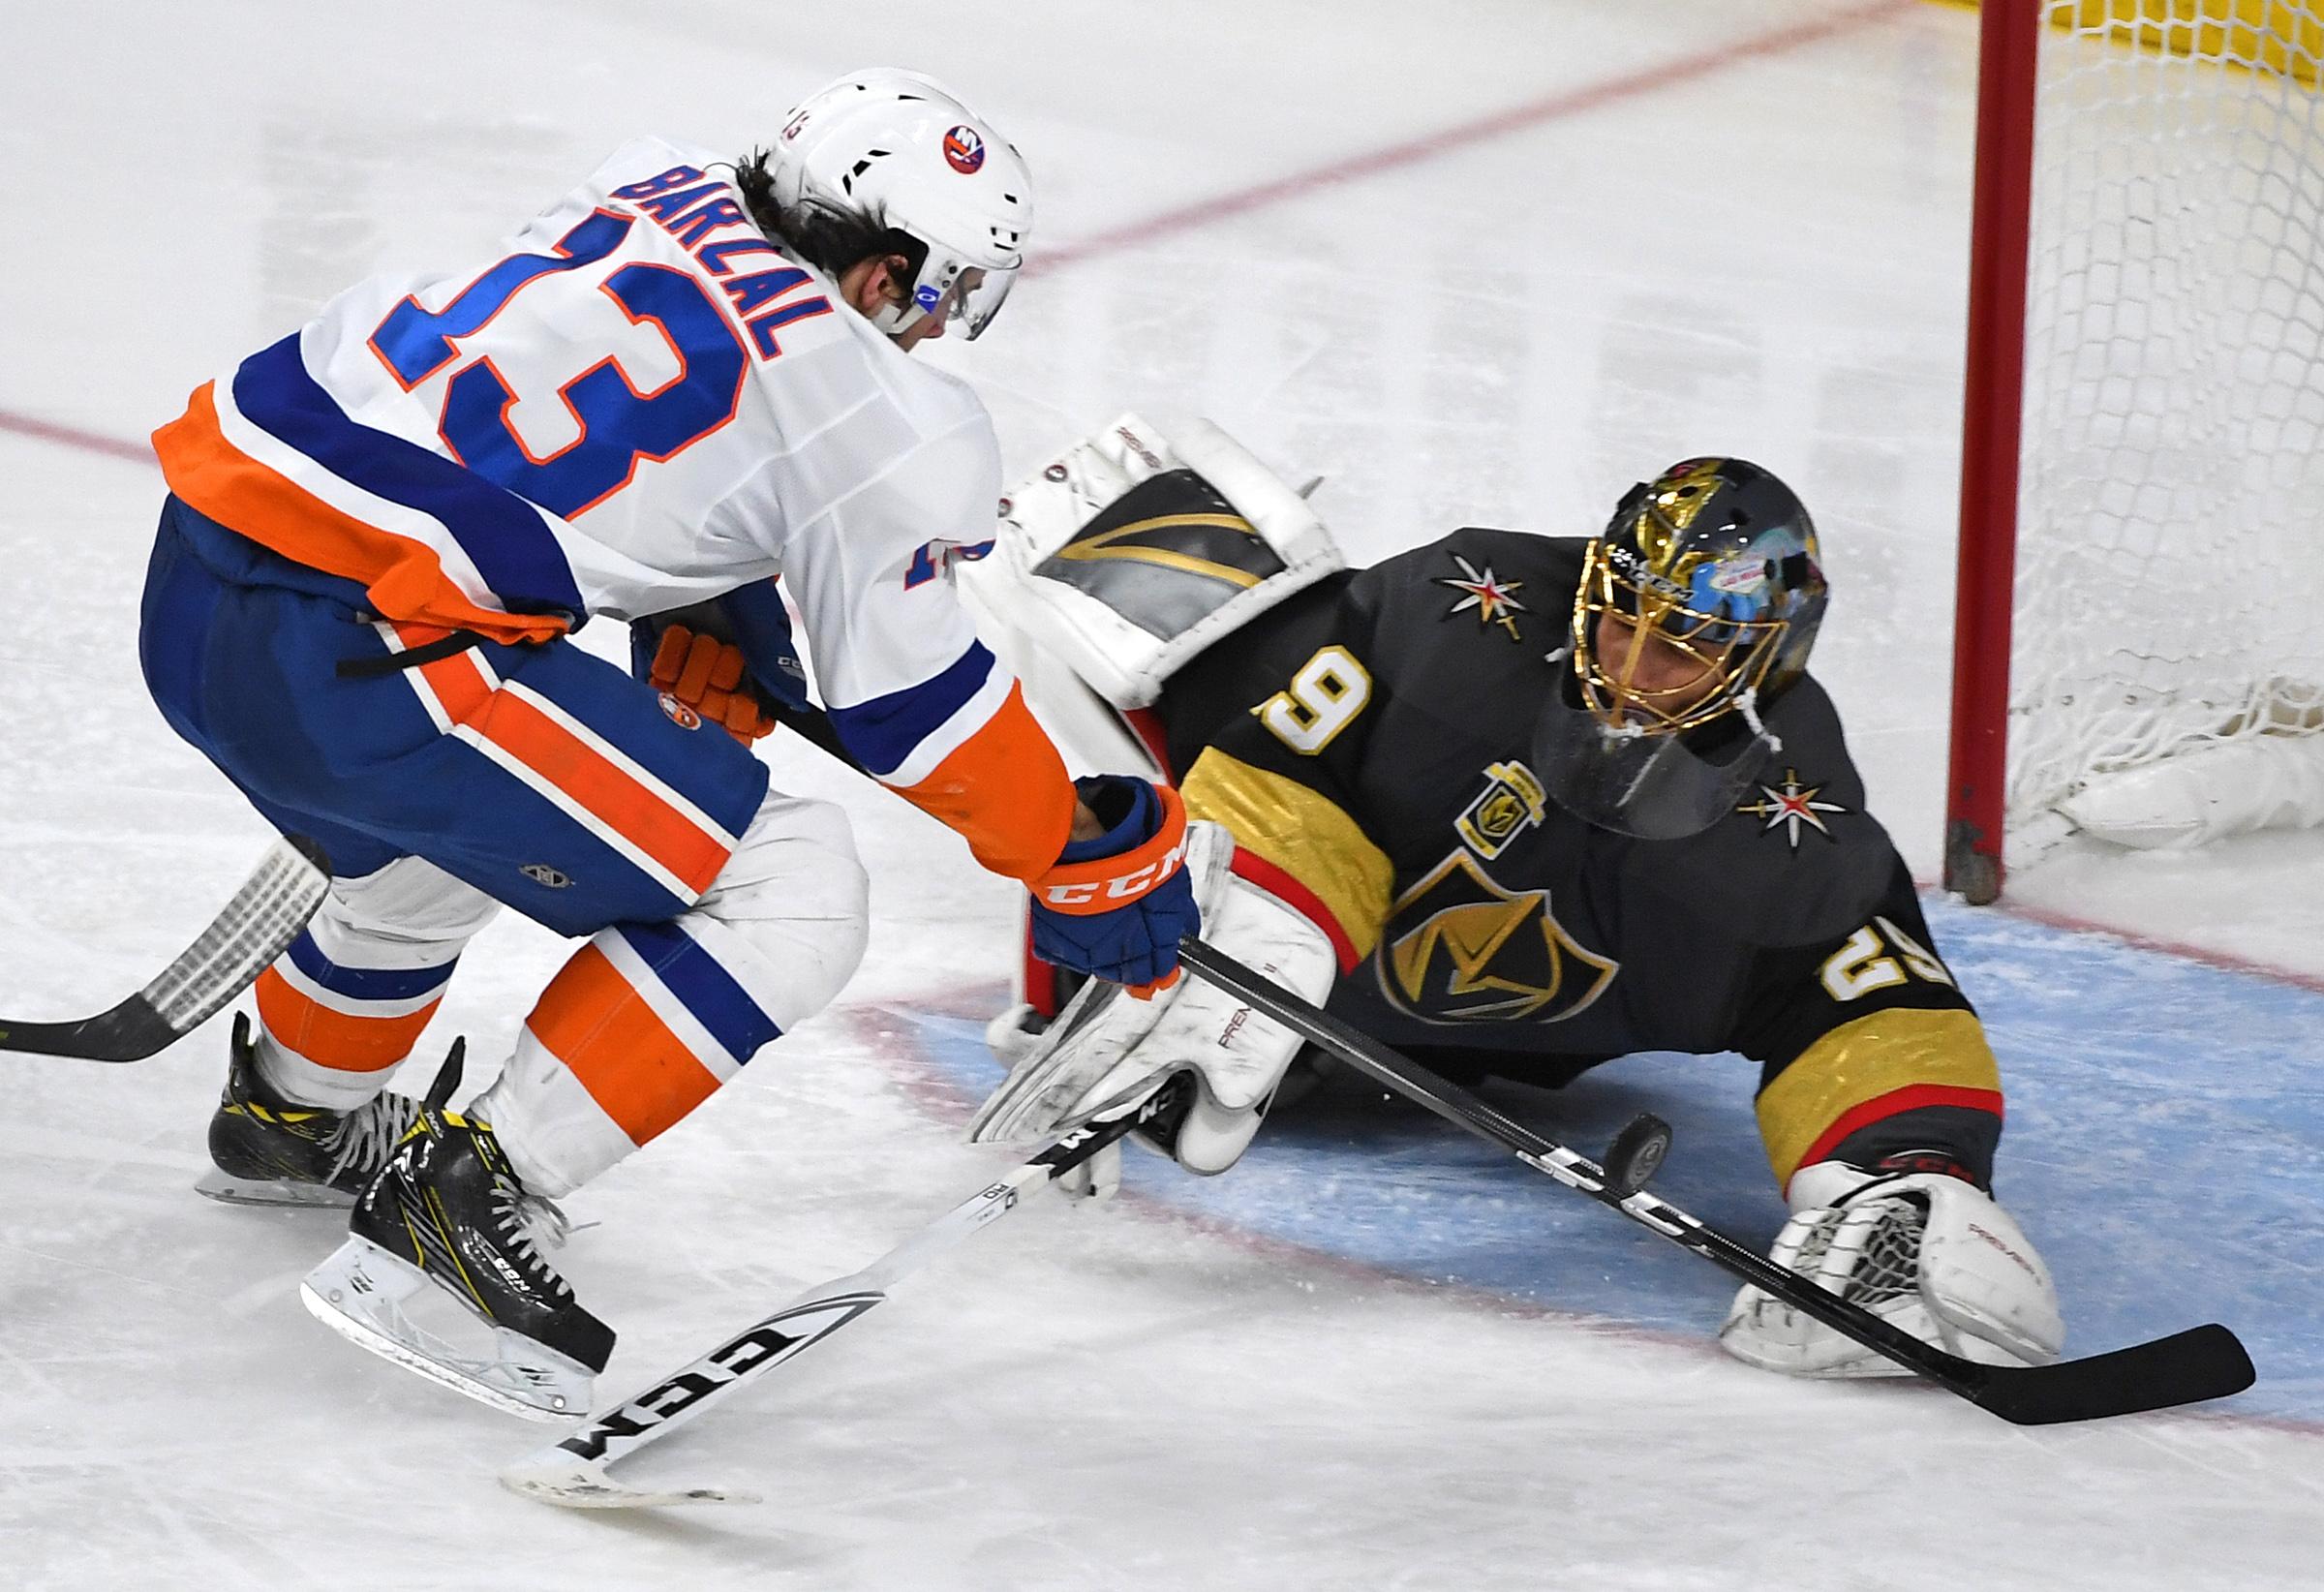 huge selection of 8f984 7ce9e Viva Las Vegas (Hockey)! - Sonics Rising